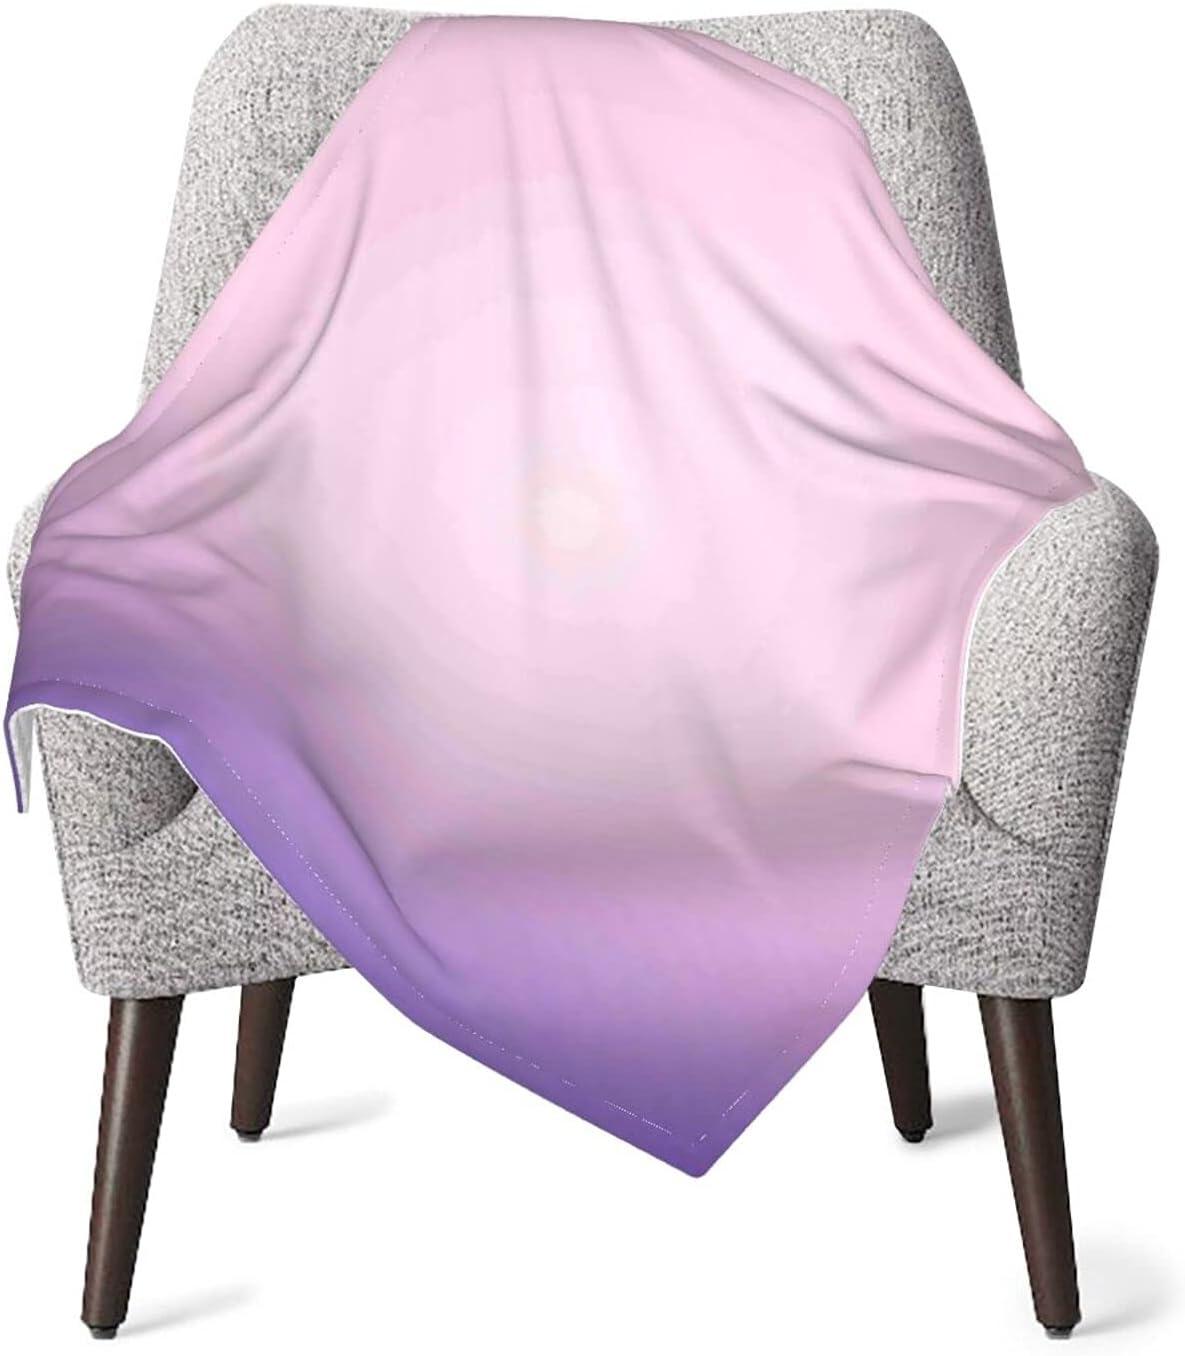 JZDACH Baby Surprise price Under blast sales Essentials Throw and Ombre Receiving Purple Pink